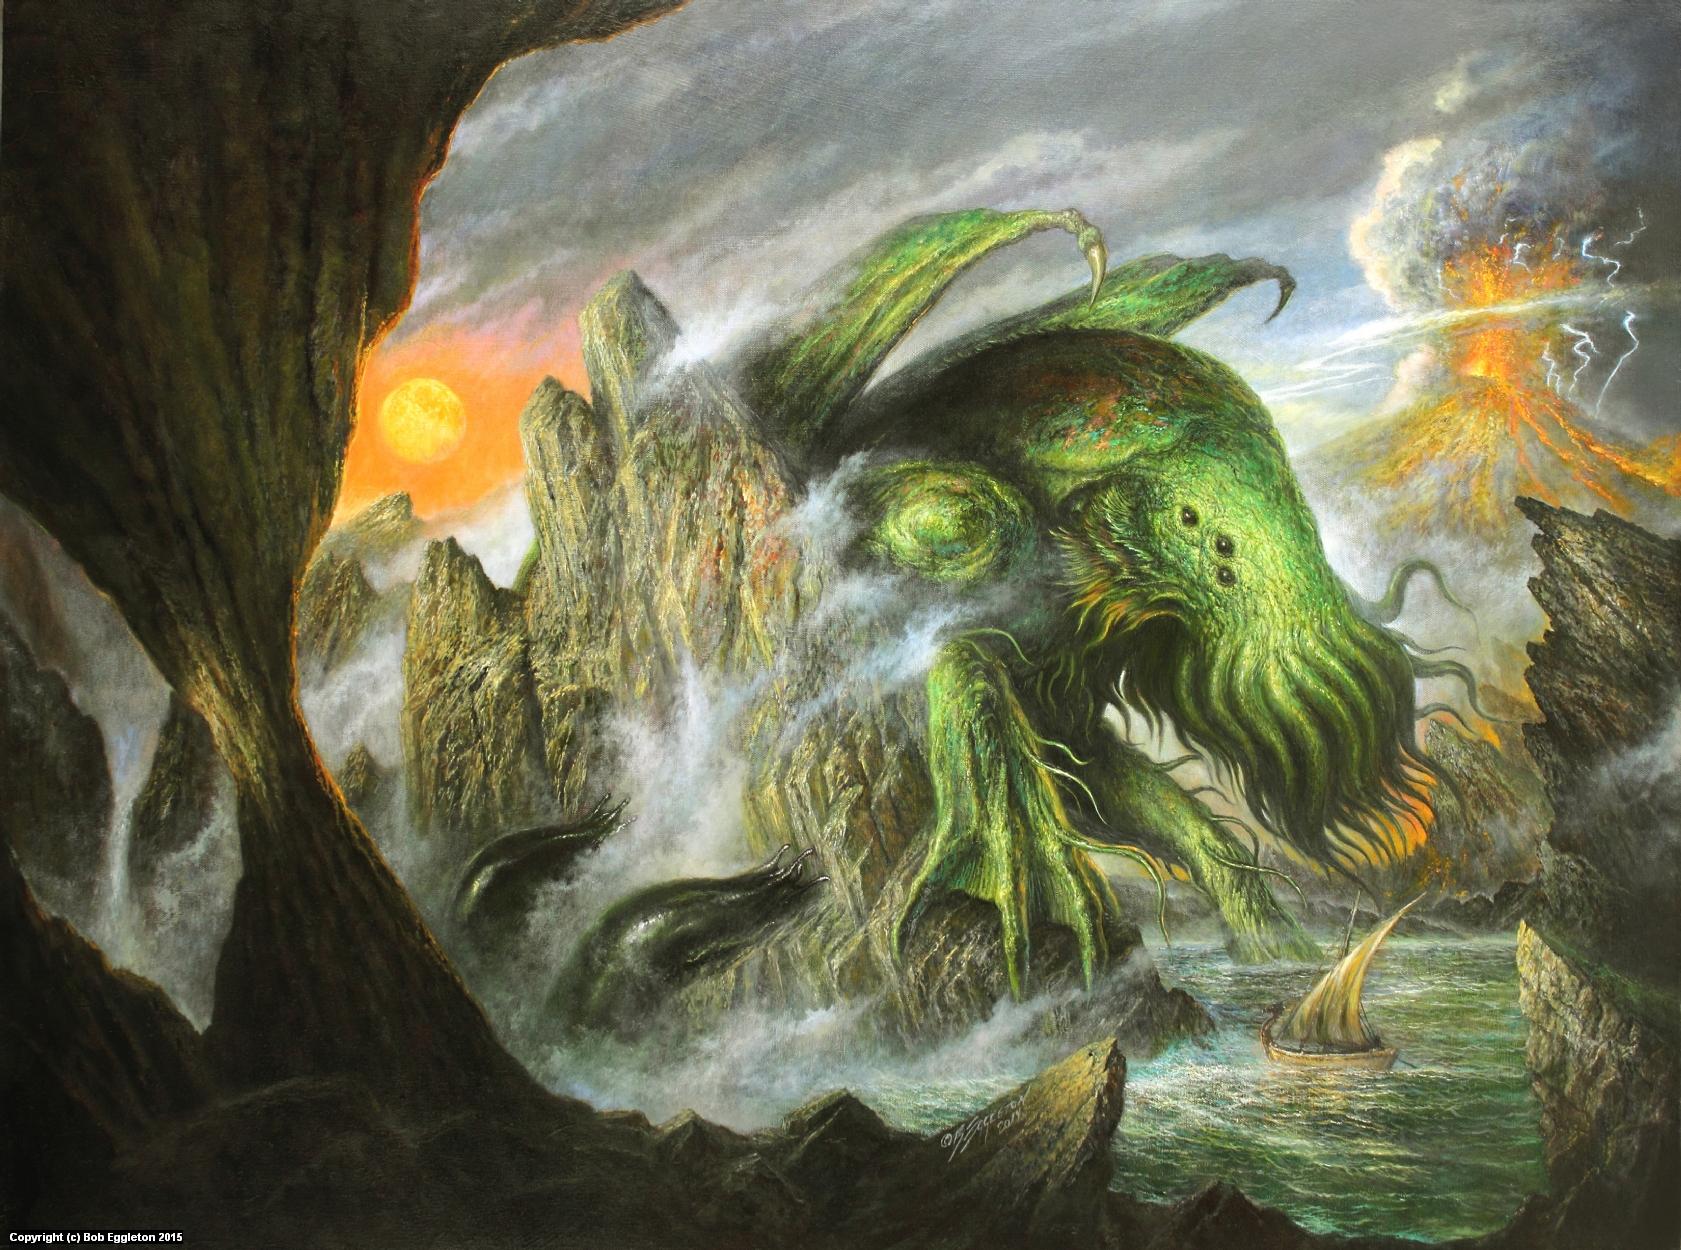 TALES OF THE PRIMAL LAND Artwork by Bob Eggleton